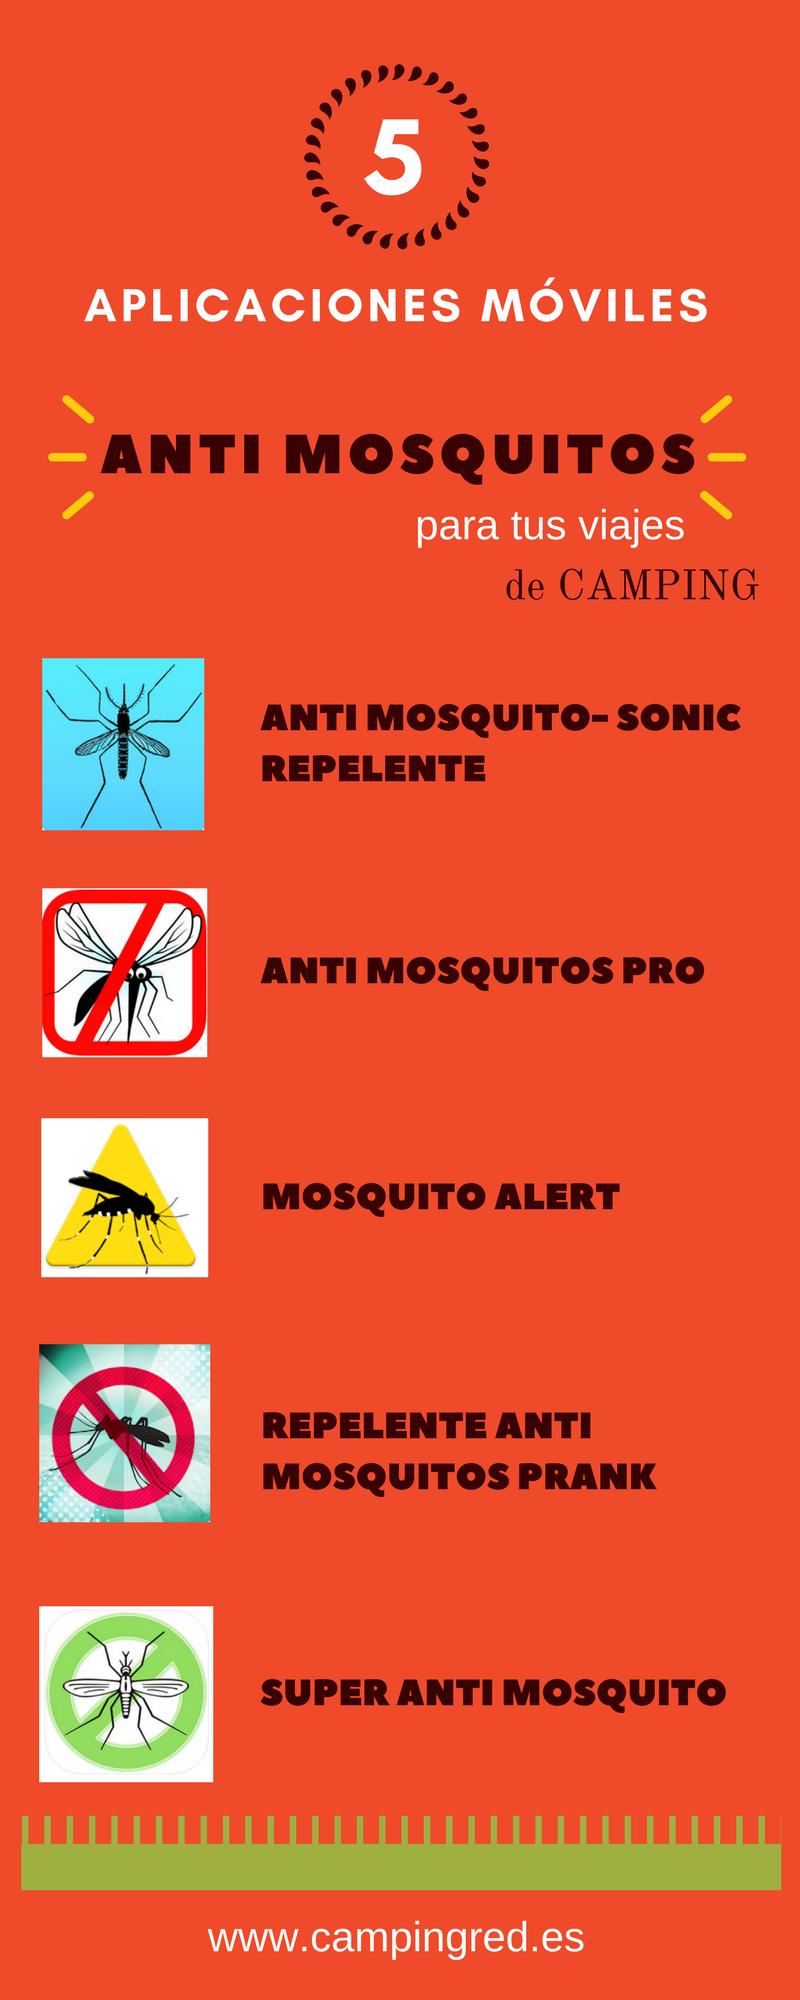 aplicaciones móviles antimosquitos